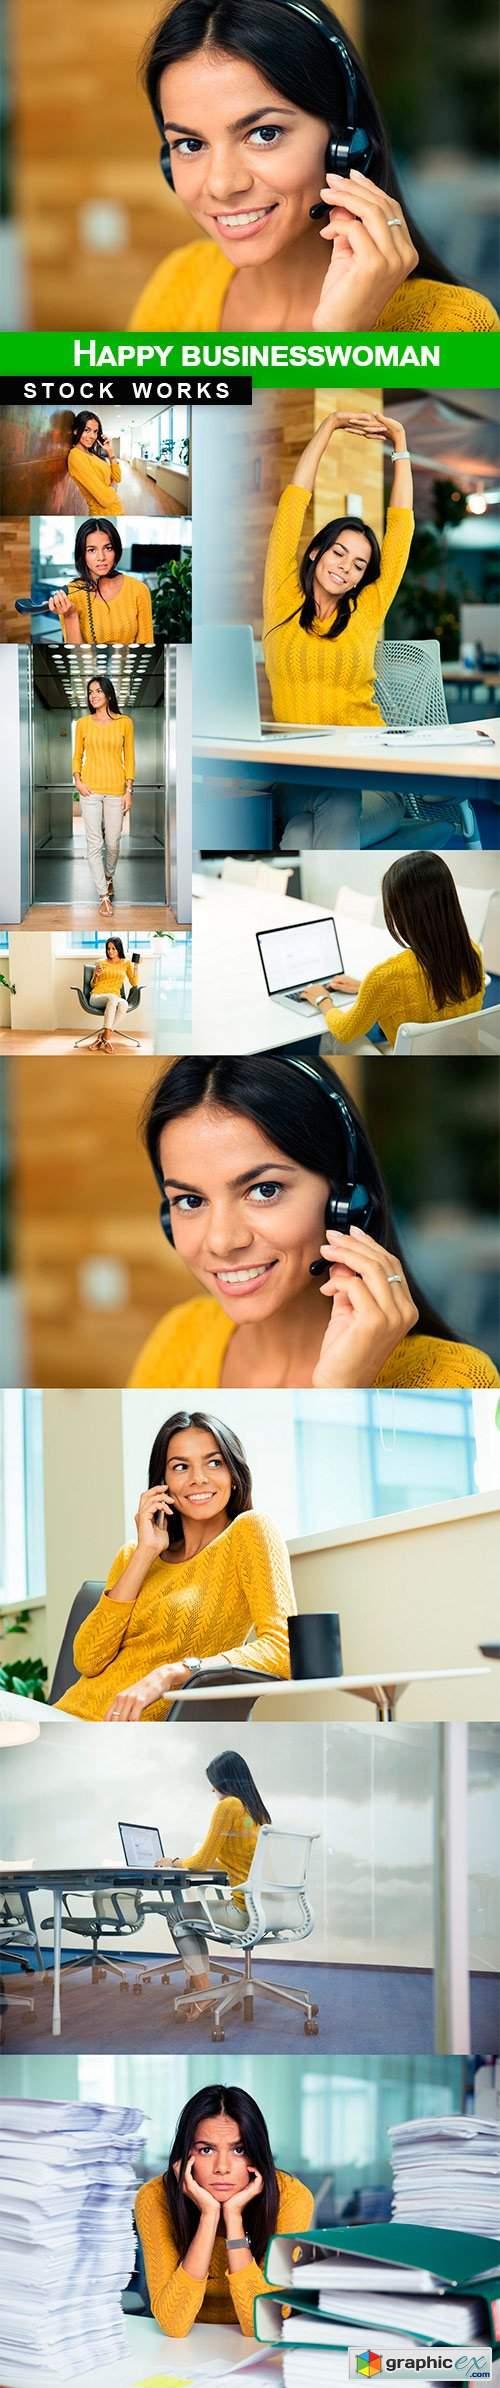 Happy businesswoman - 10 UHQ JPEG